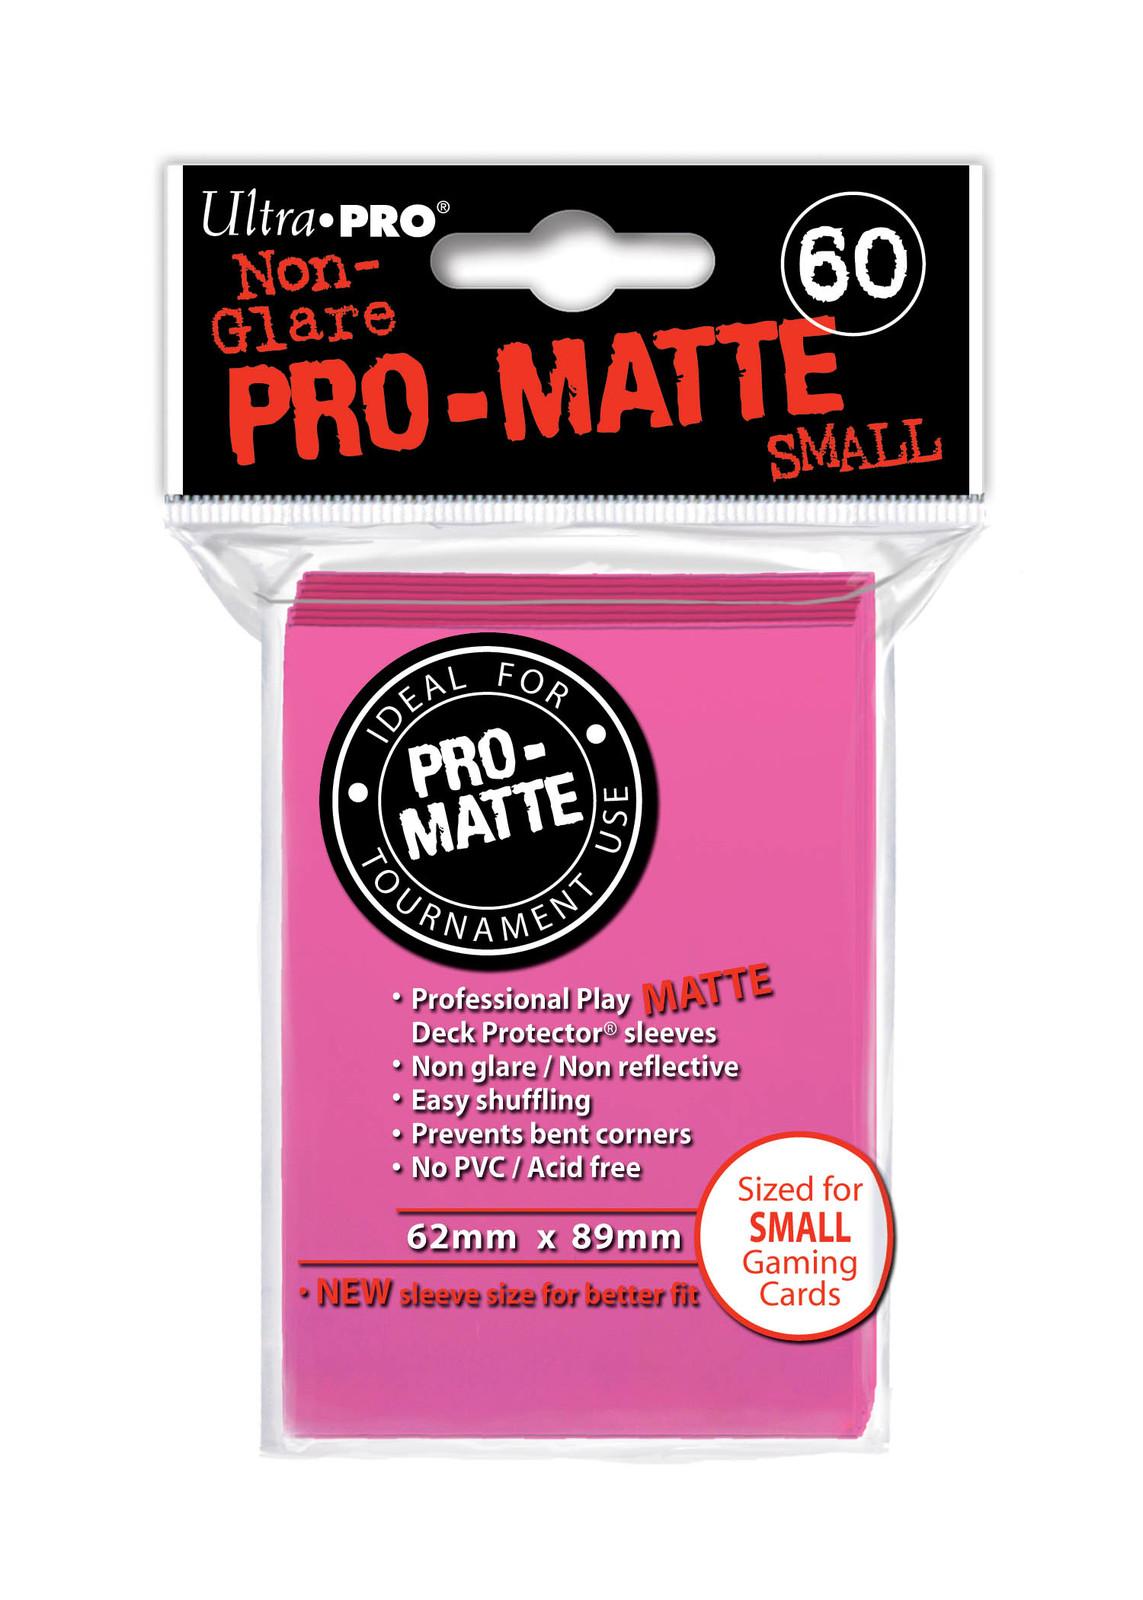 Ultra Pro: Deck Protectors - Pro-Matte Small Bright Pink (60) image